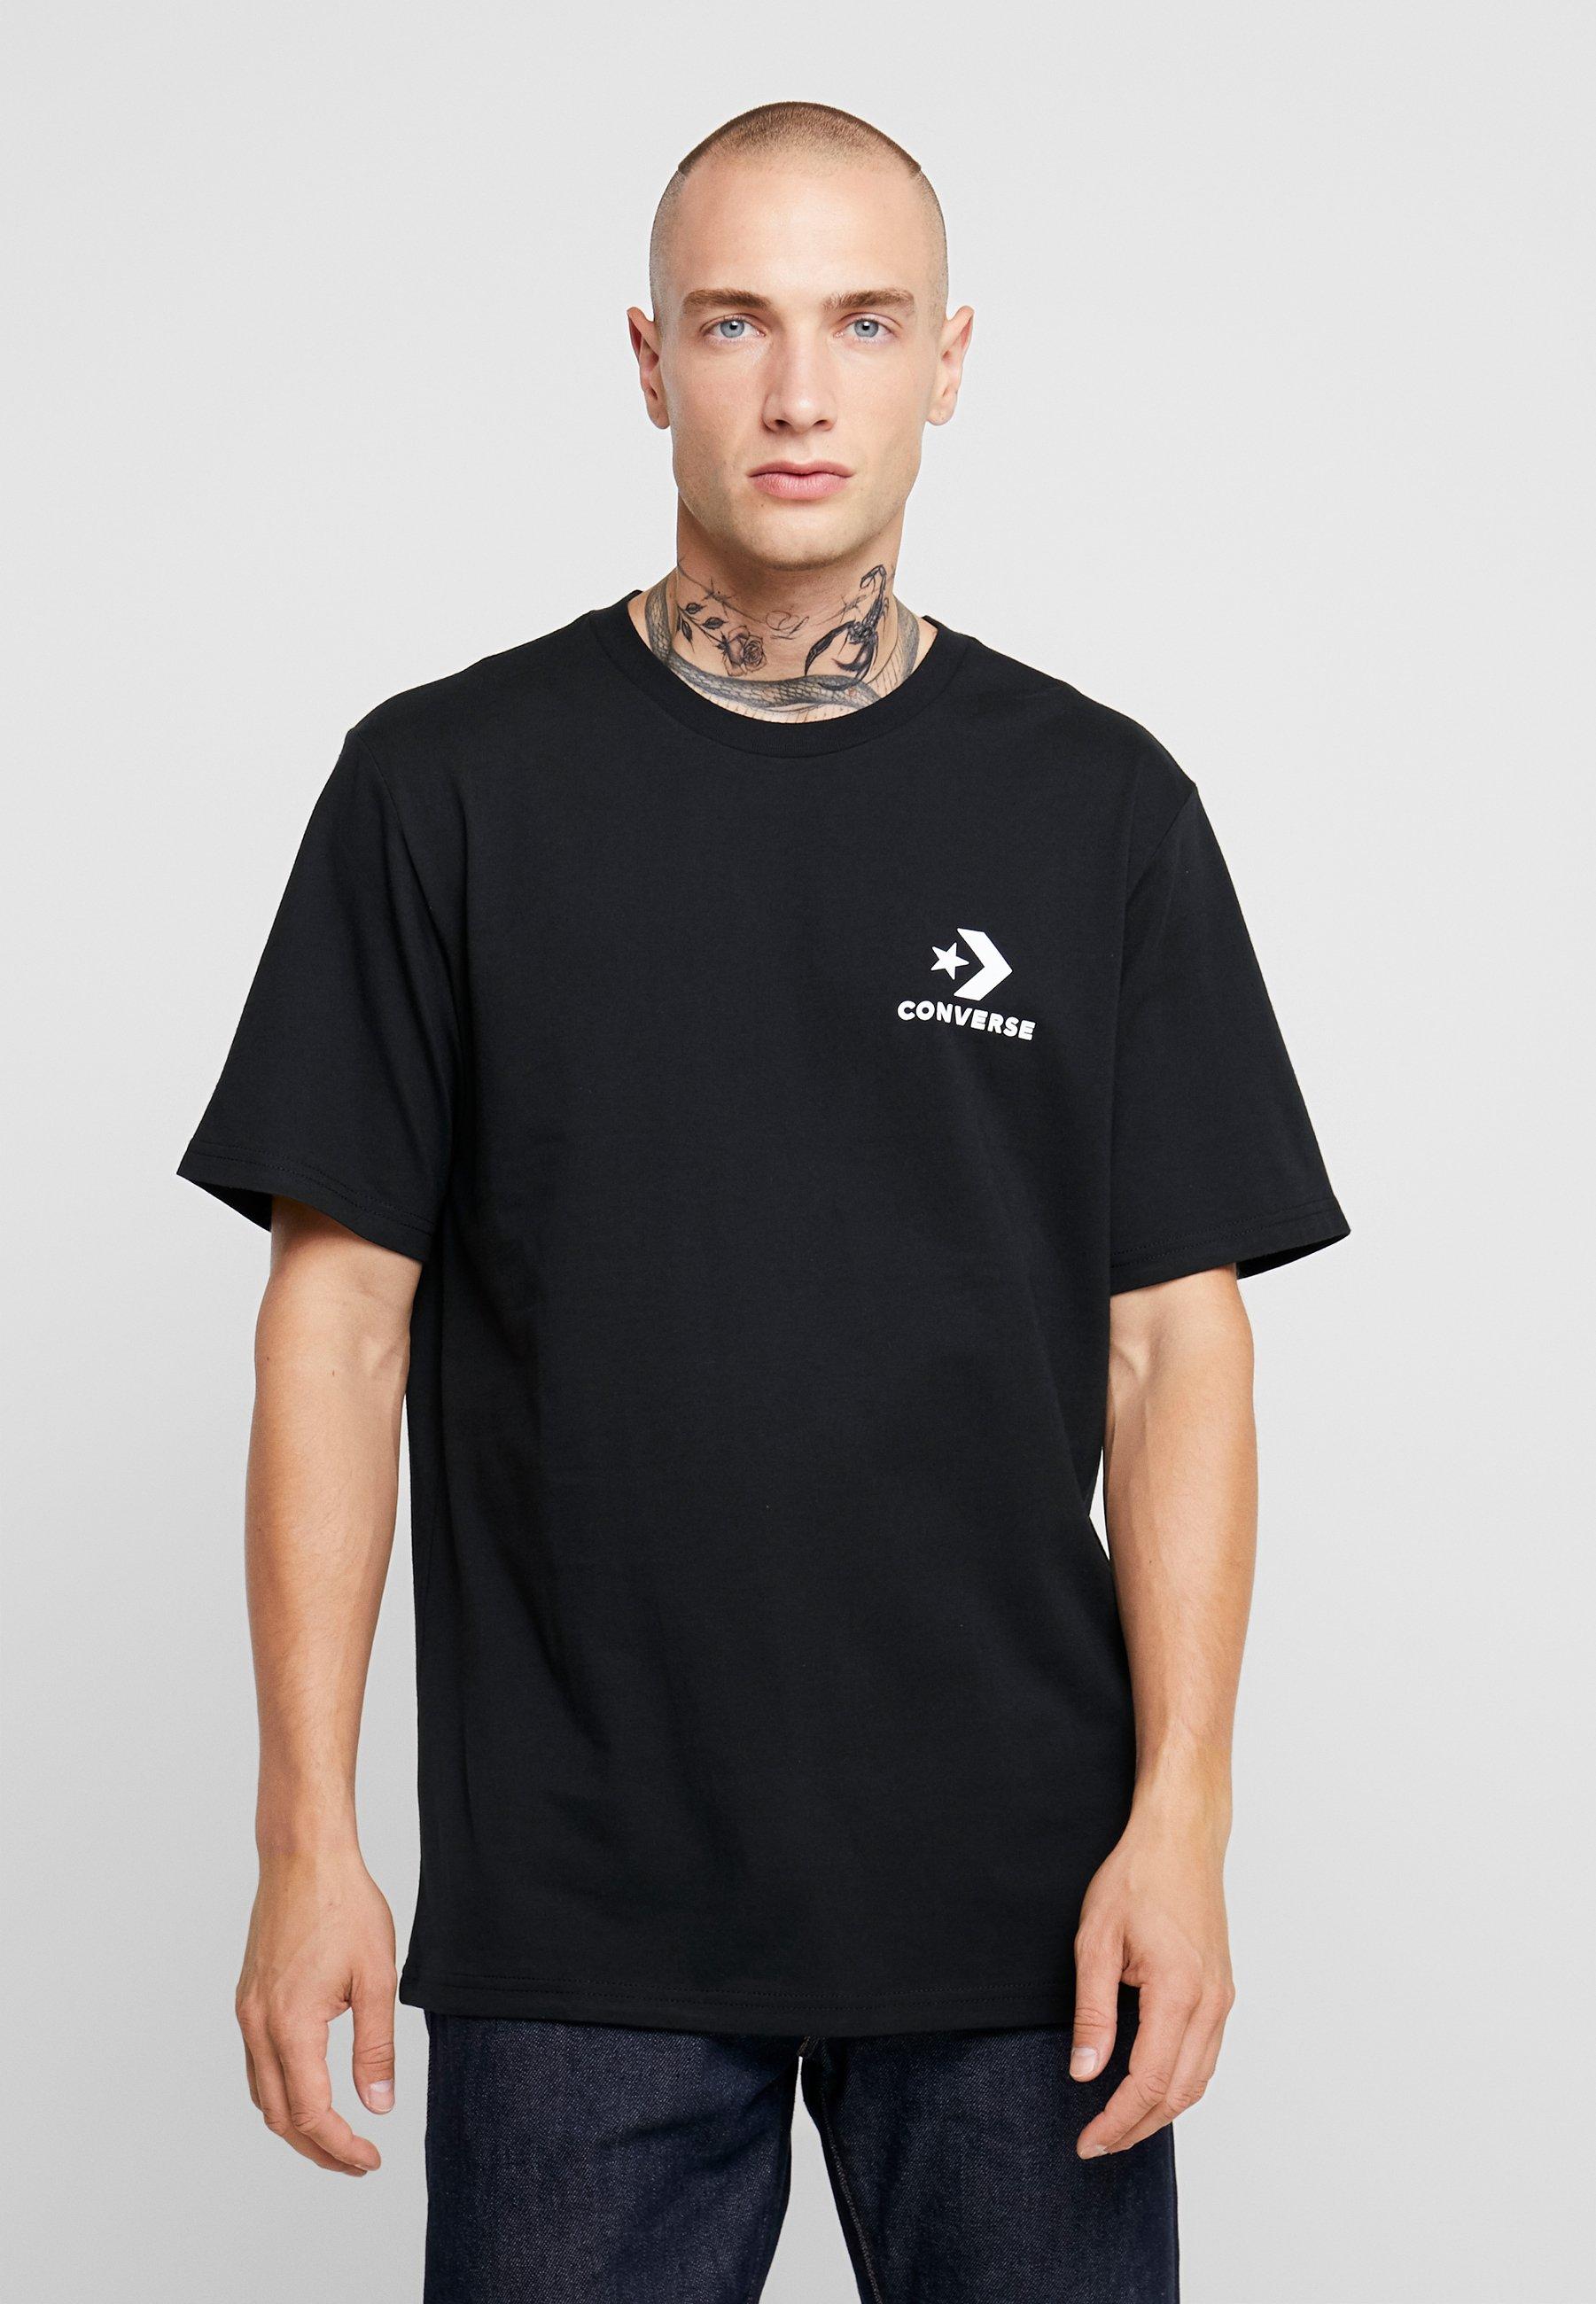 Left Chevron Star TeeT Imprimé Black shirt Chest Converse Rqc3L5Aj4